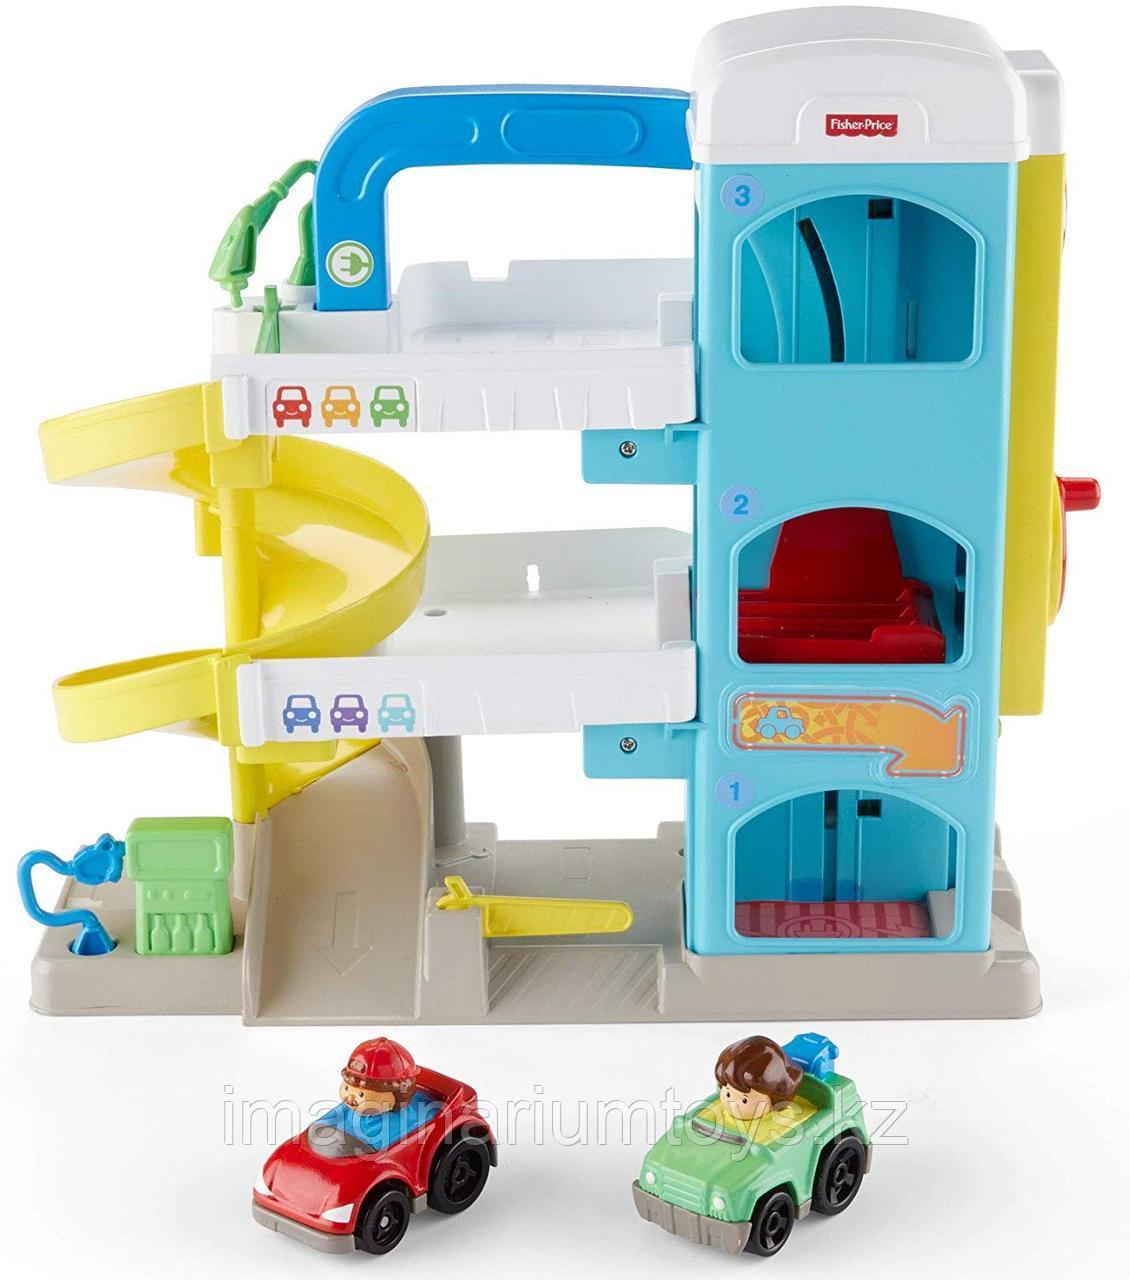 Интерактивная развивающая игрушка Гараж Fisher-Price